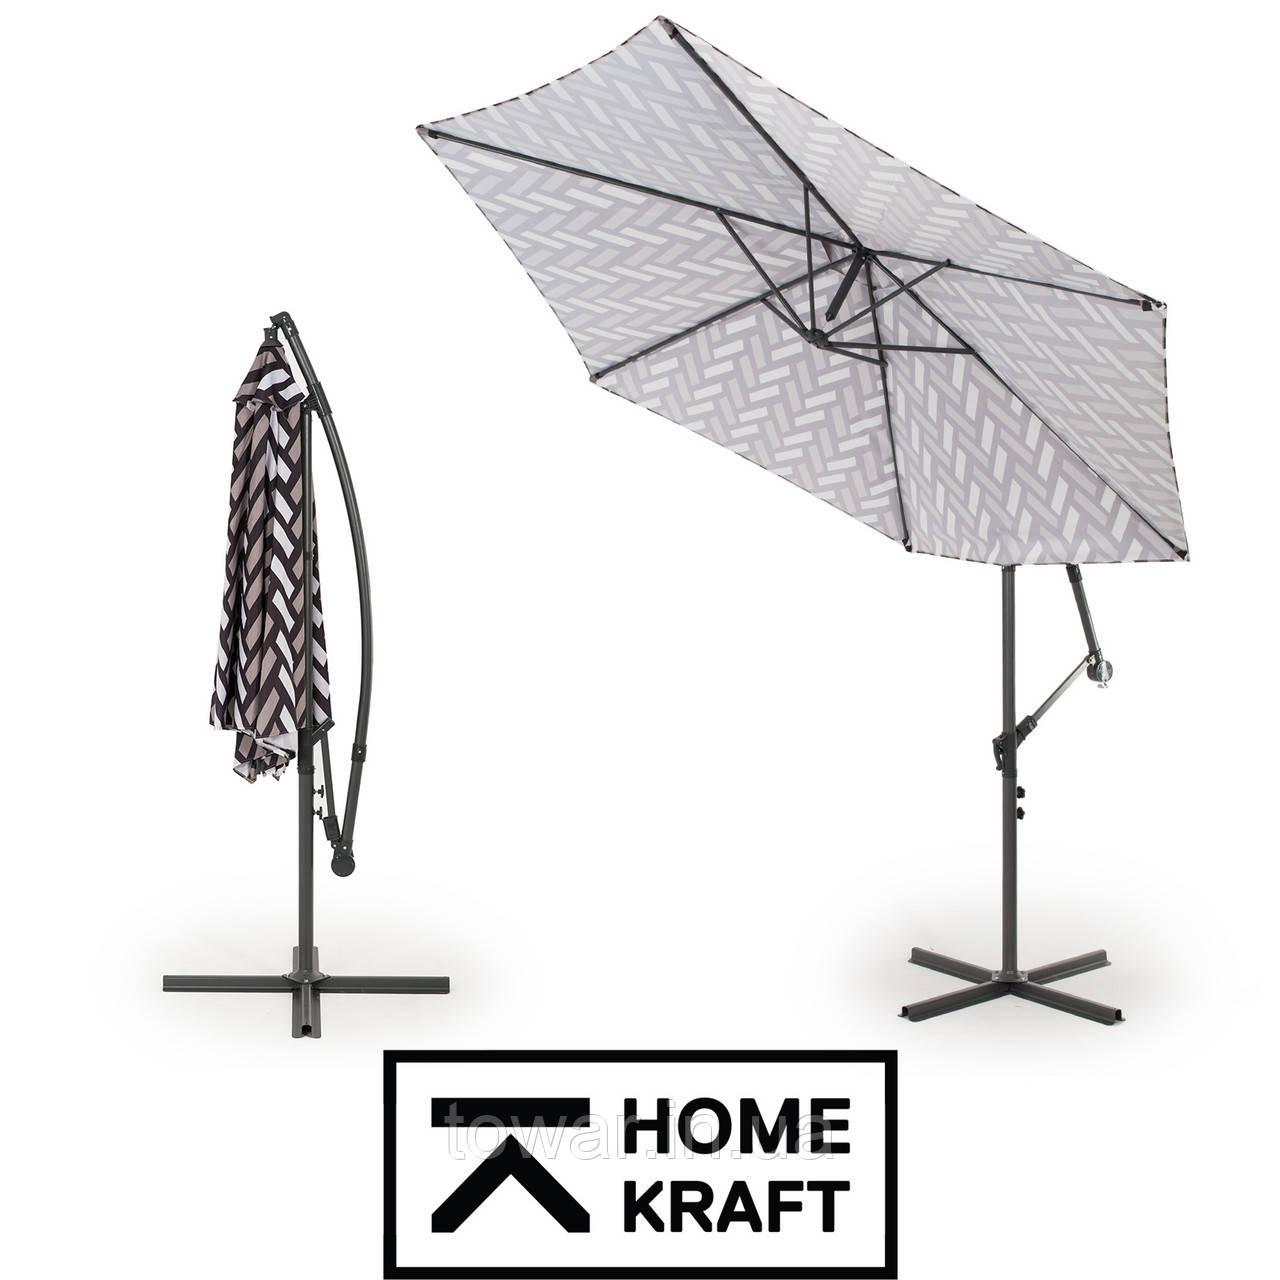 Cадовый зонт LUMI MODERN 300 см